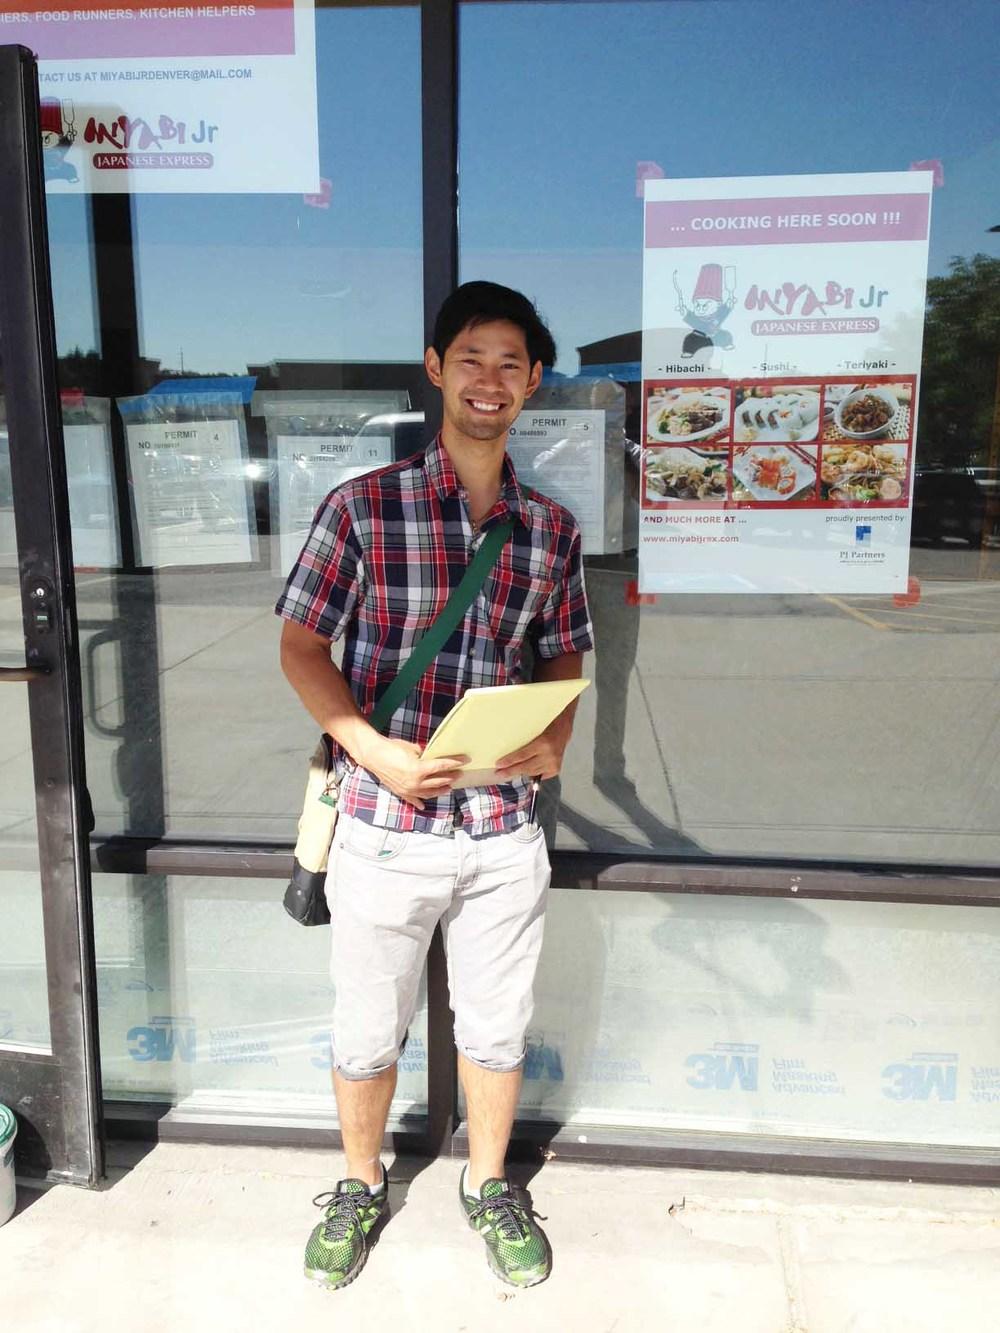 Junya Nakajima in front of the soon to open Miyabi Jr. Express, Denver CO